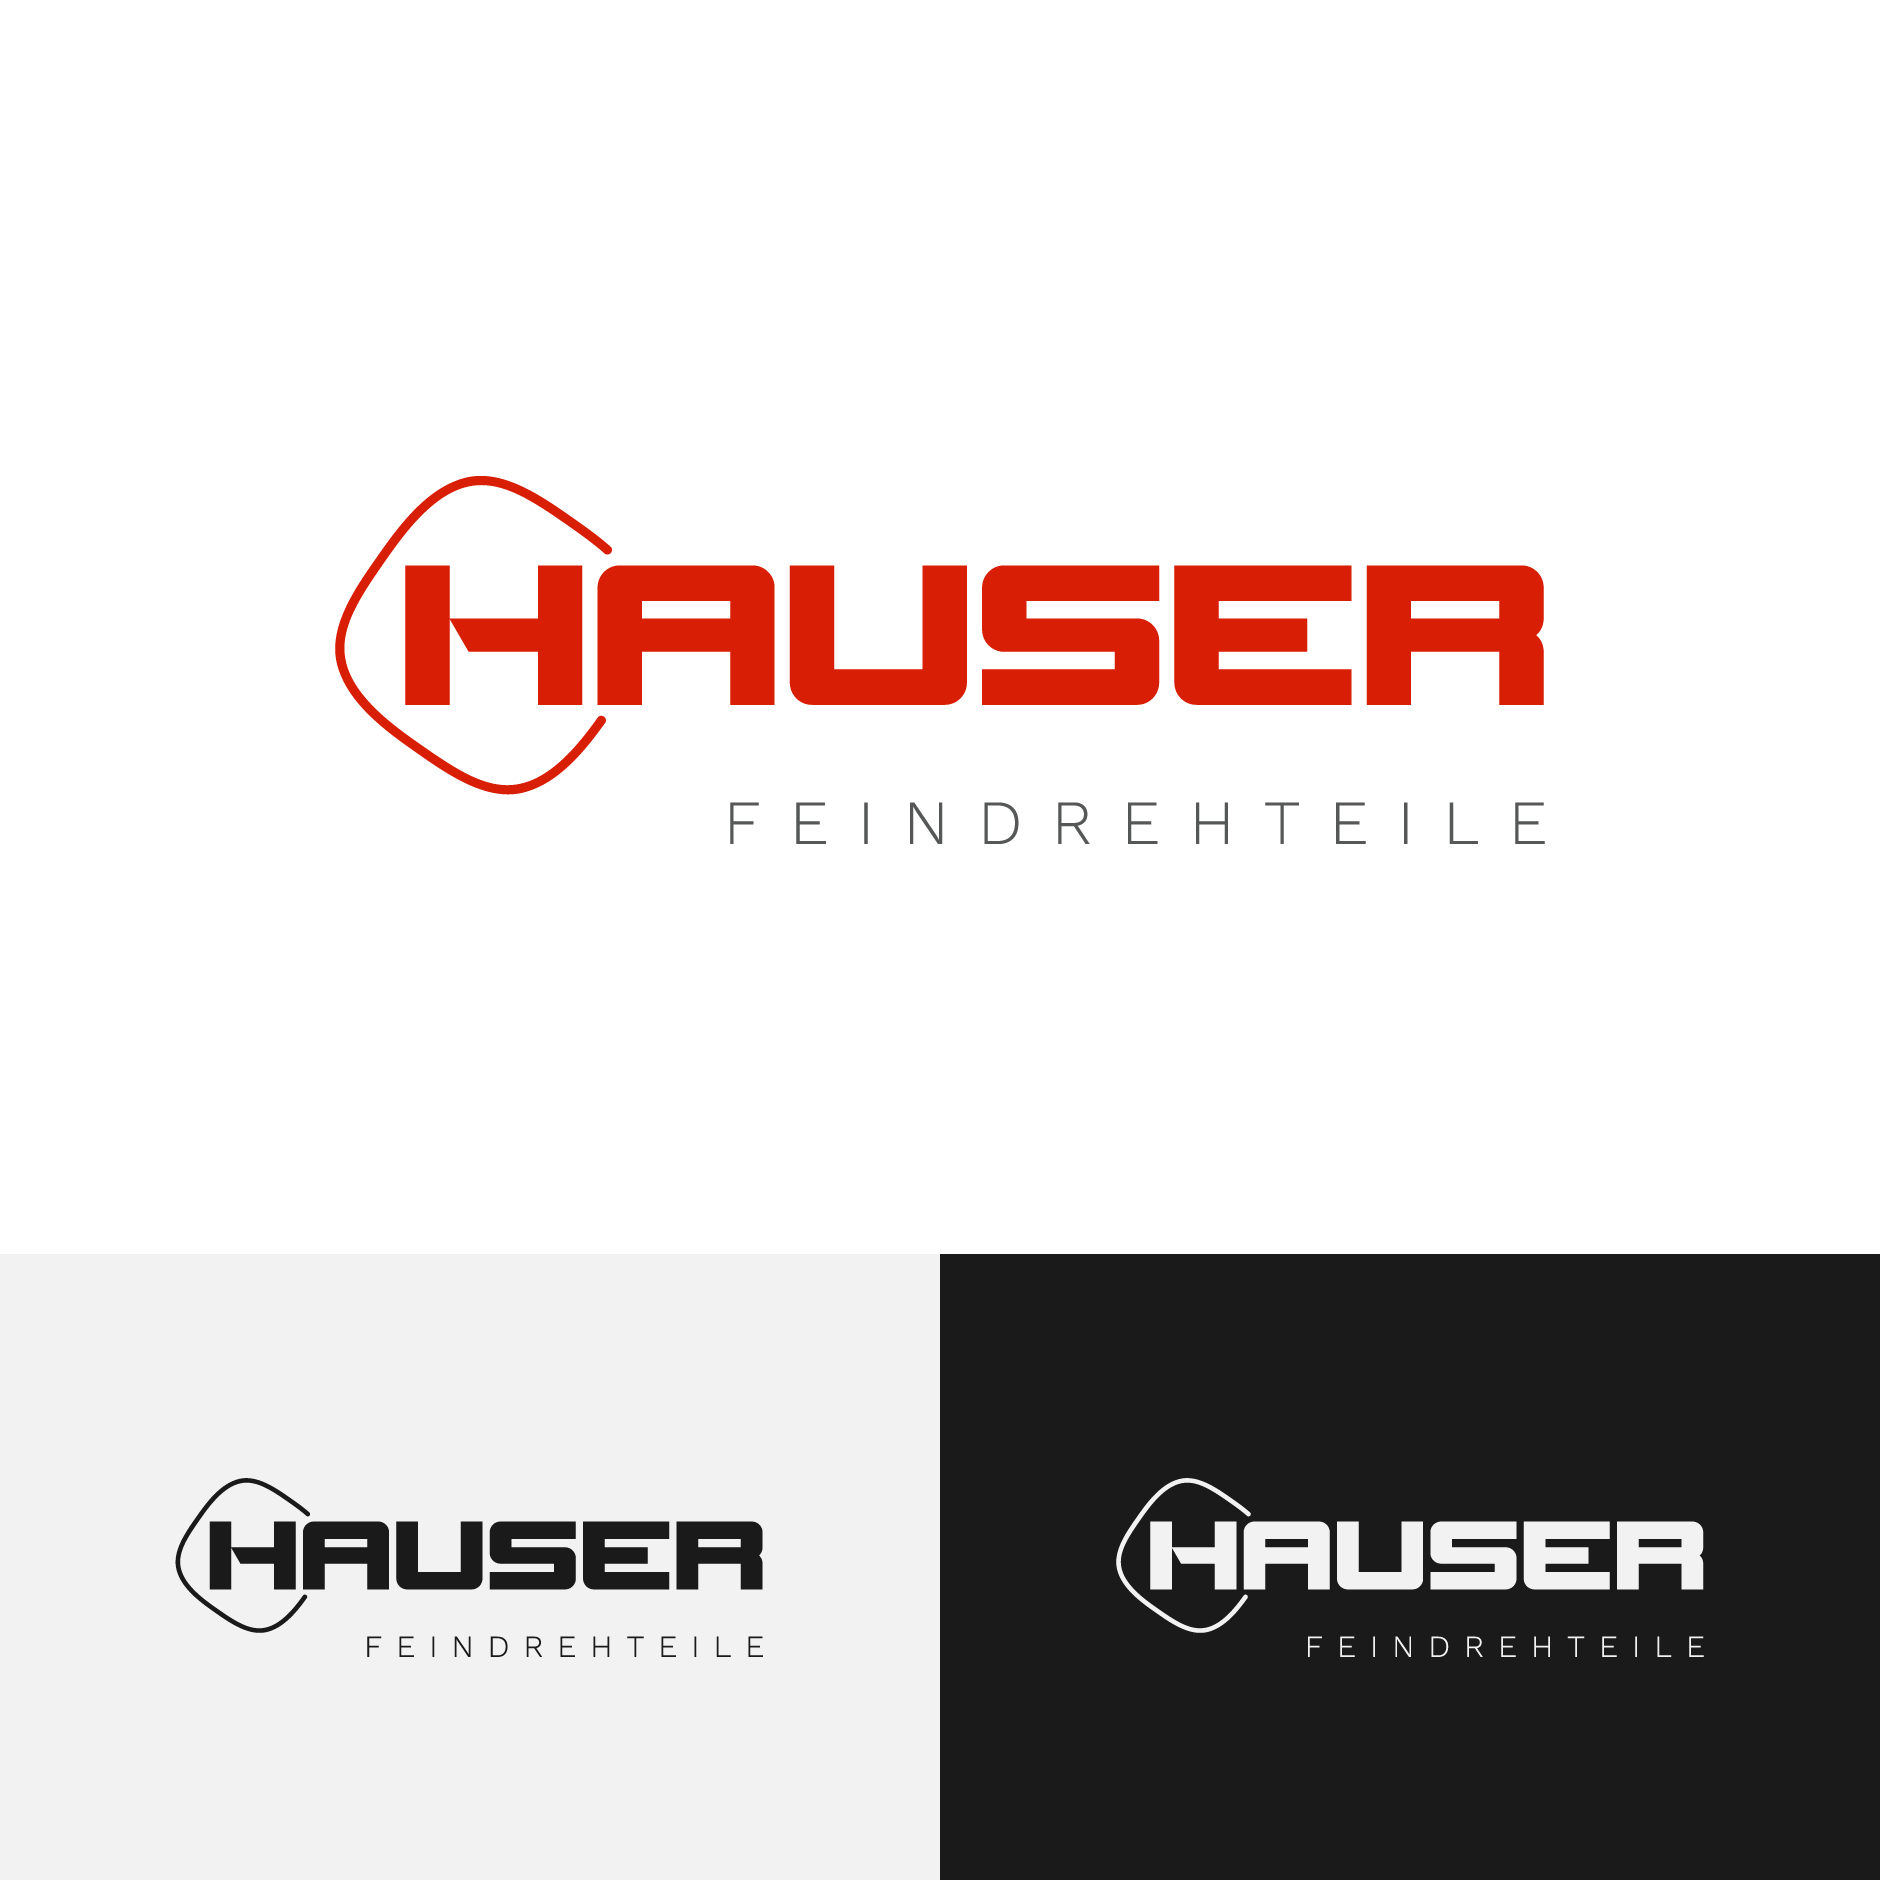 hauser feindrehteile tuningen logodesign-Logodesign Hauser Feindrehteile